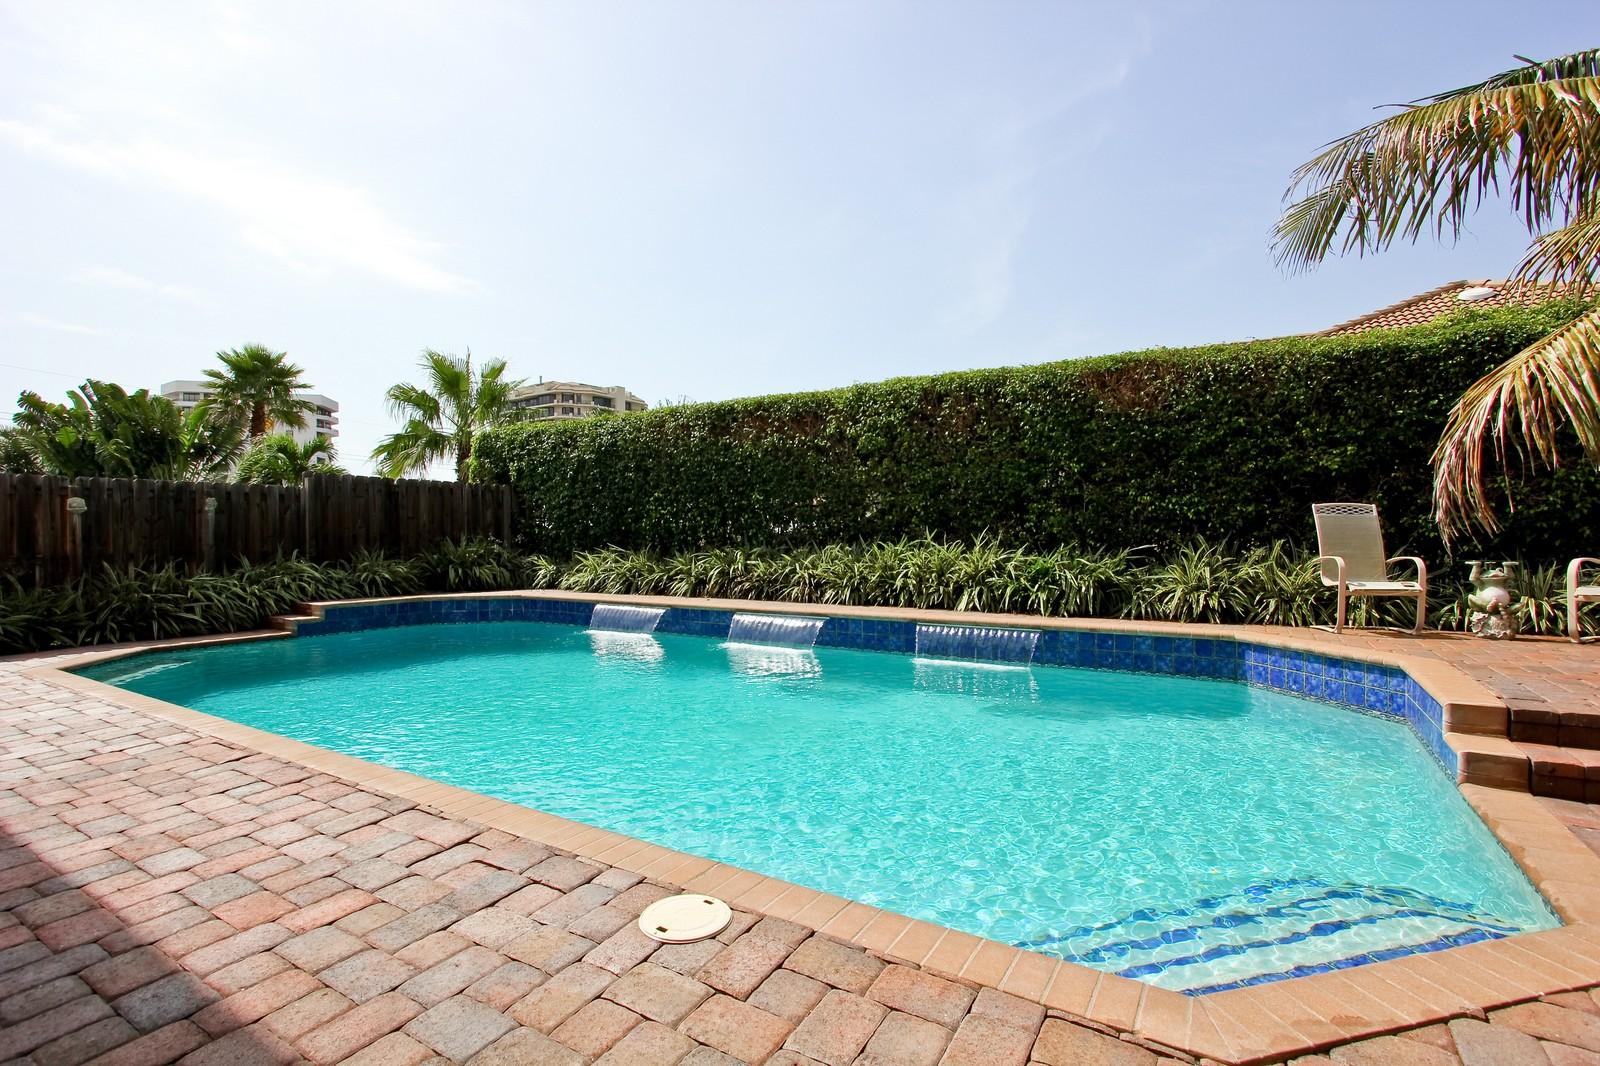 Real Estate Photography - 430 N. Lyra Circle, Juno Beach, FL, 33408 - Location 2